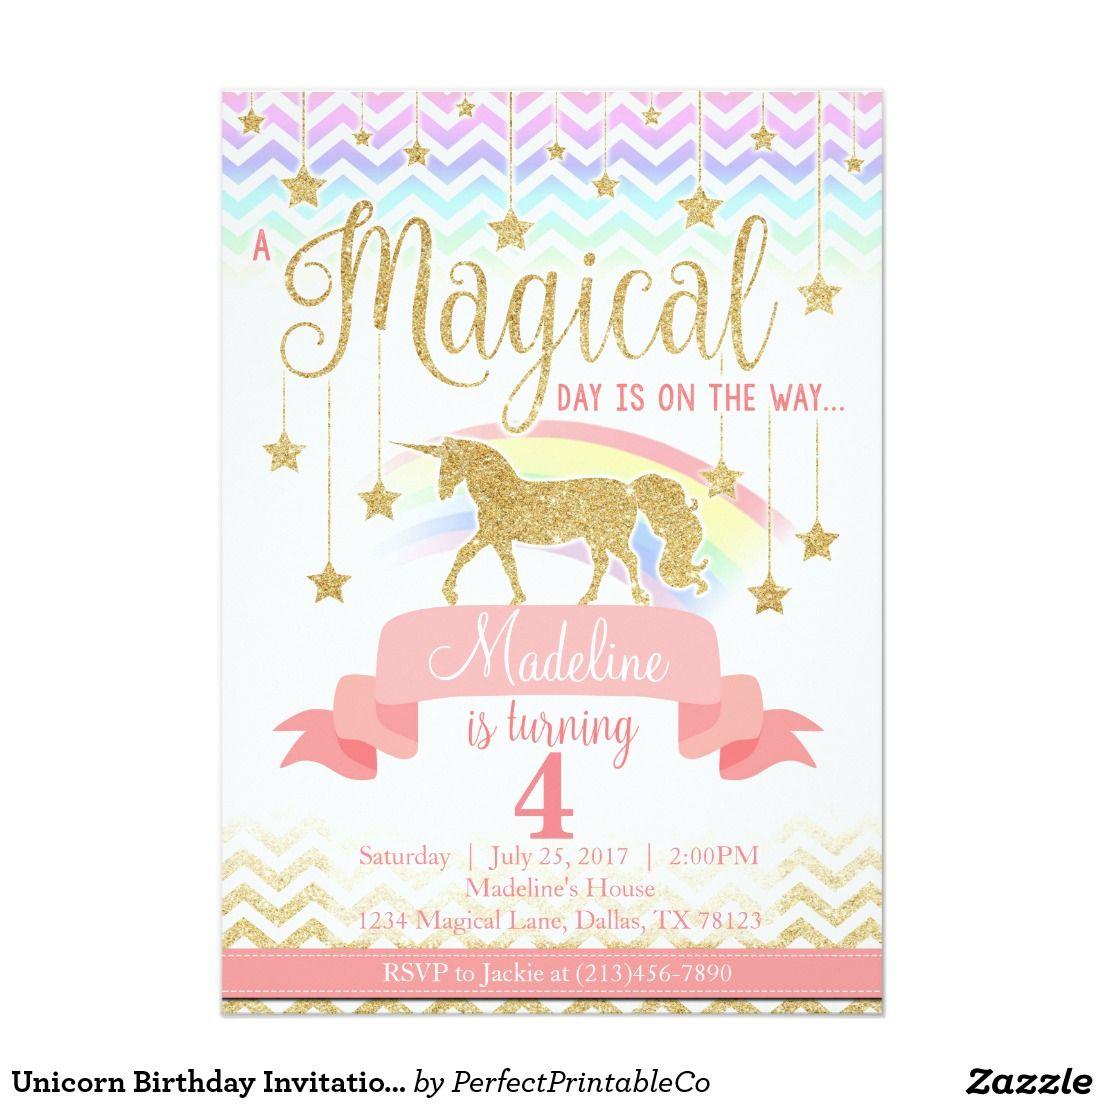 Einladung 6 Geburtstag: Unicorn Birthday Invitation